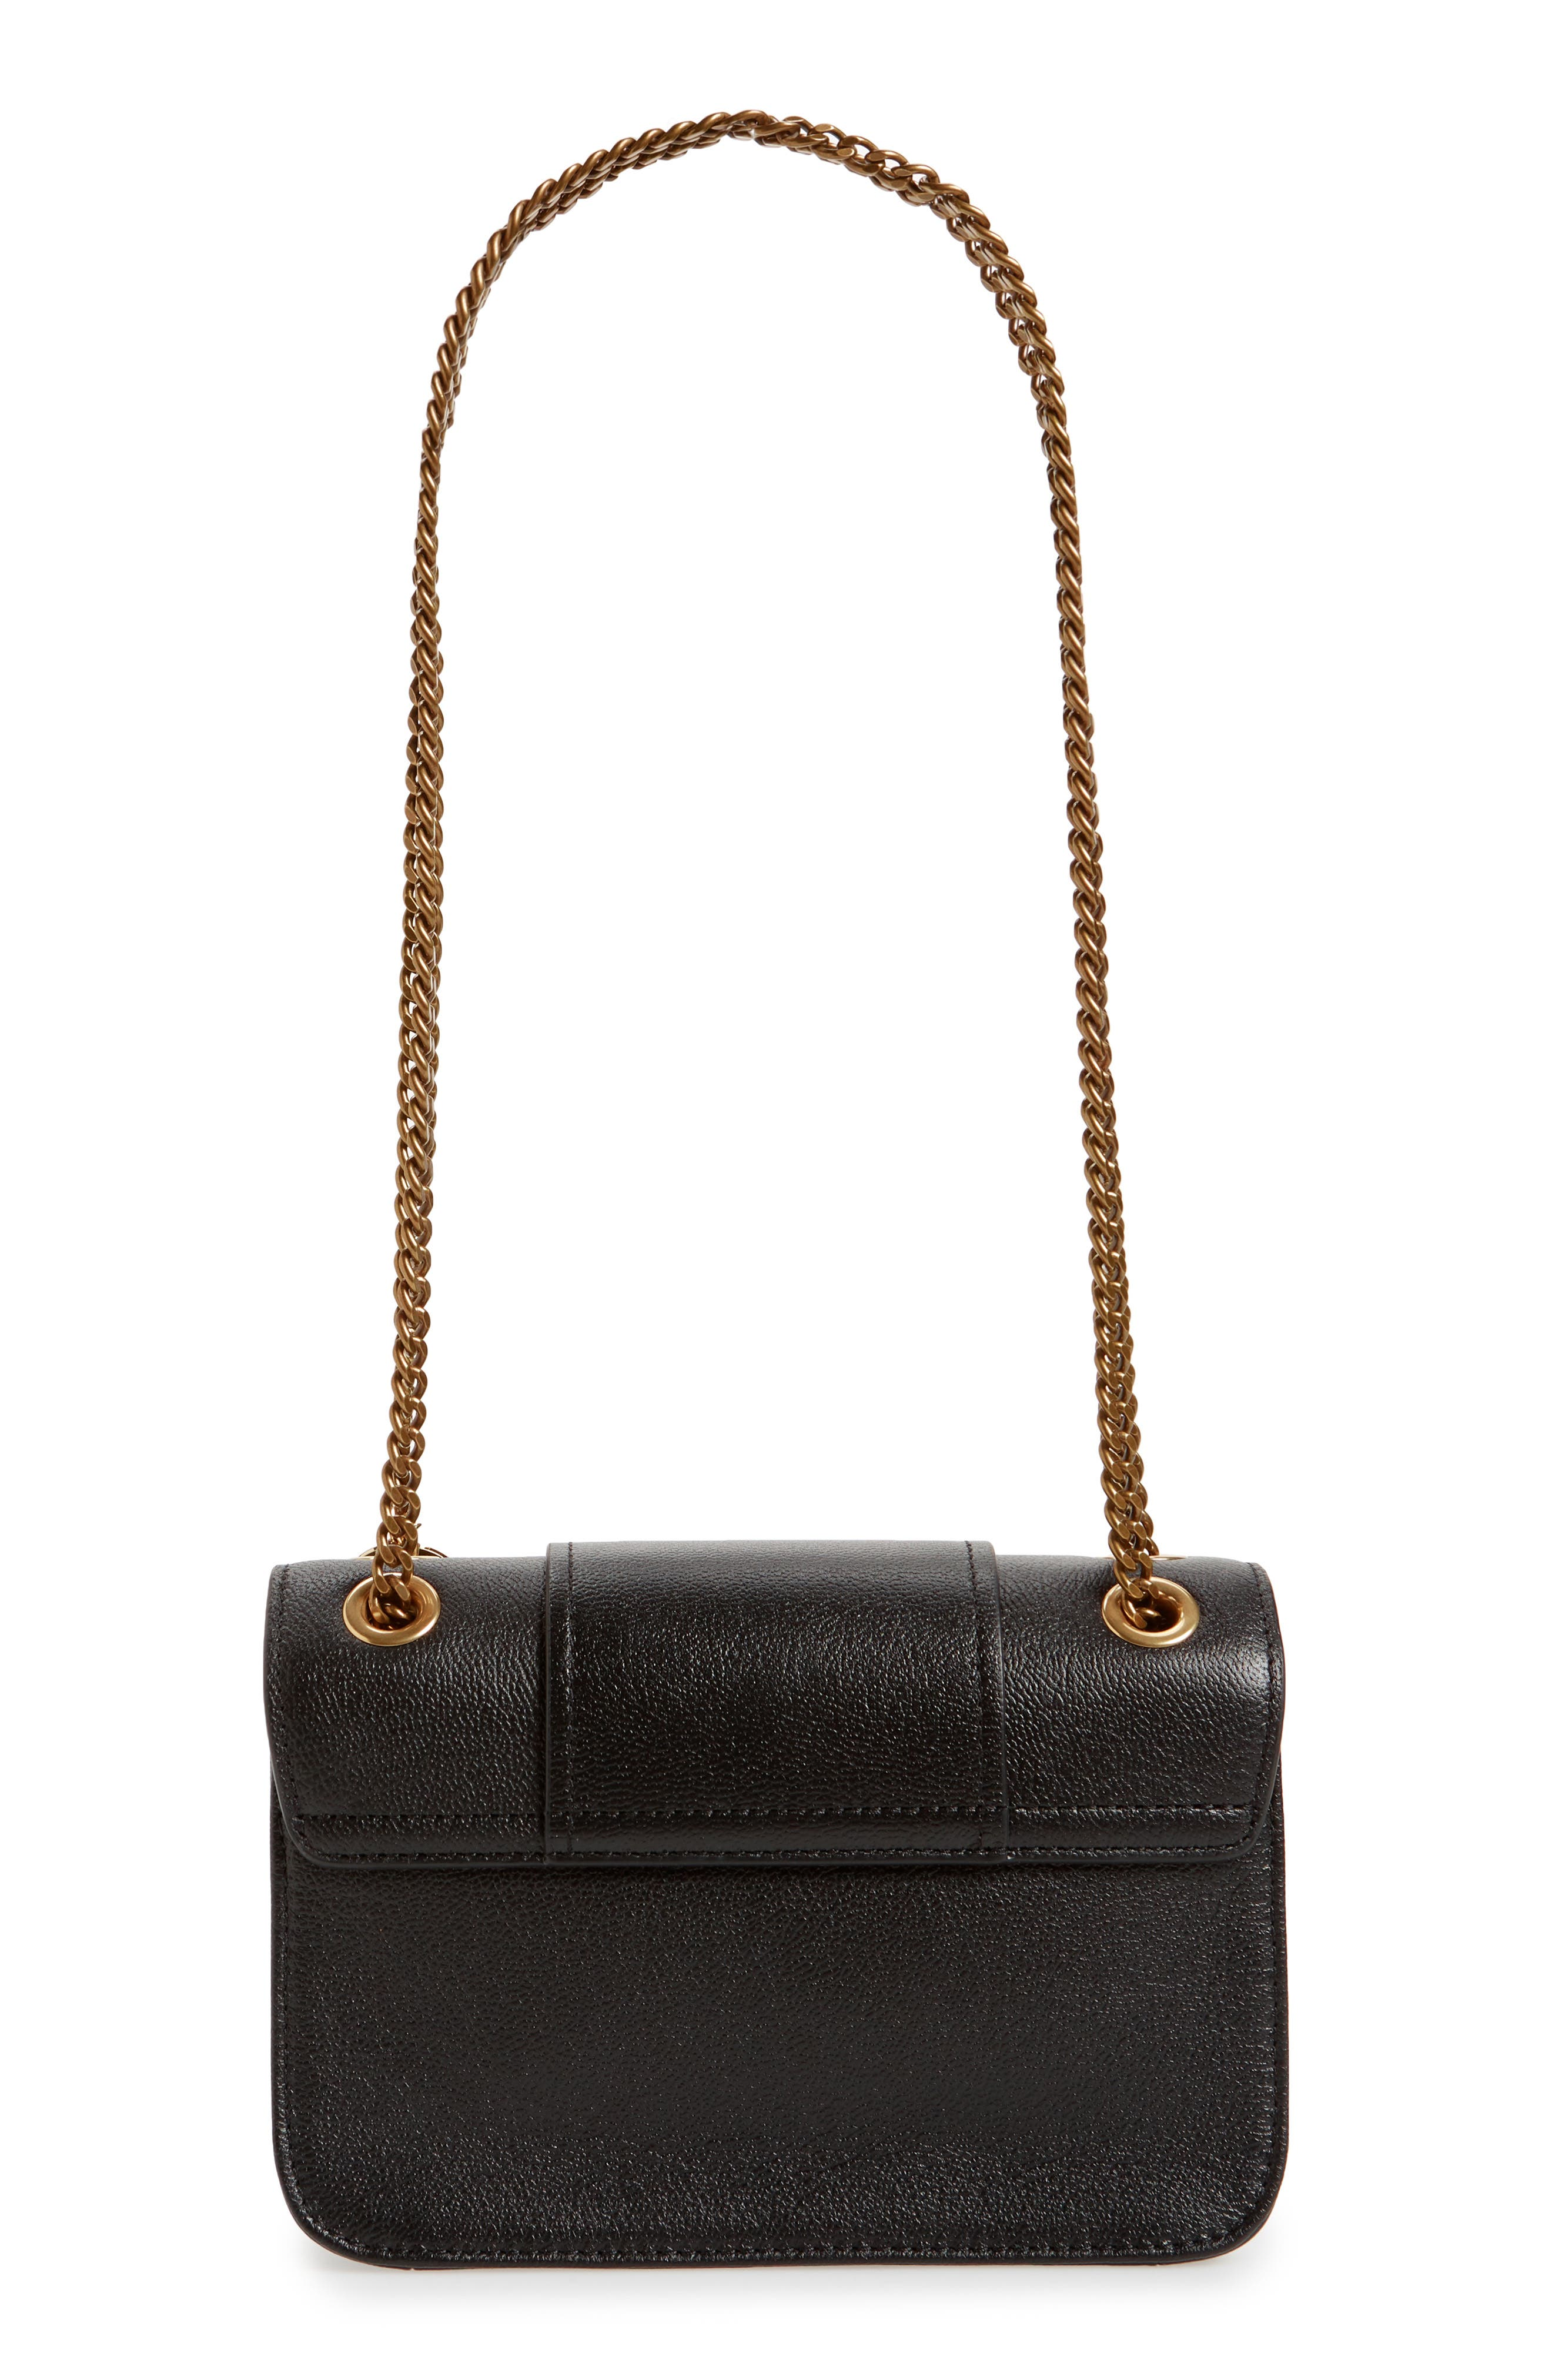 SEE BY CHLOÉ, Hopper Leather Shoulder Bag, Alternate thumbnail 4, color, 001